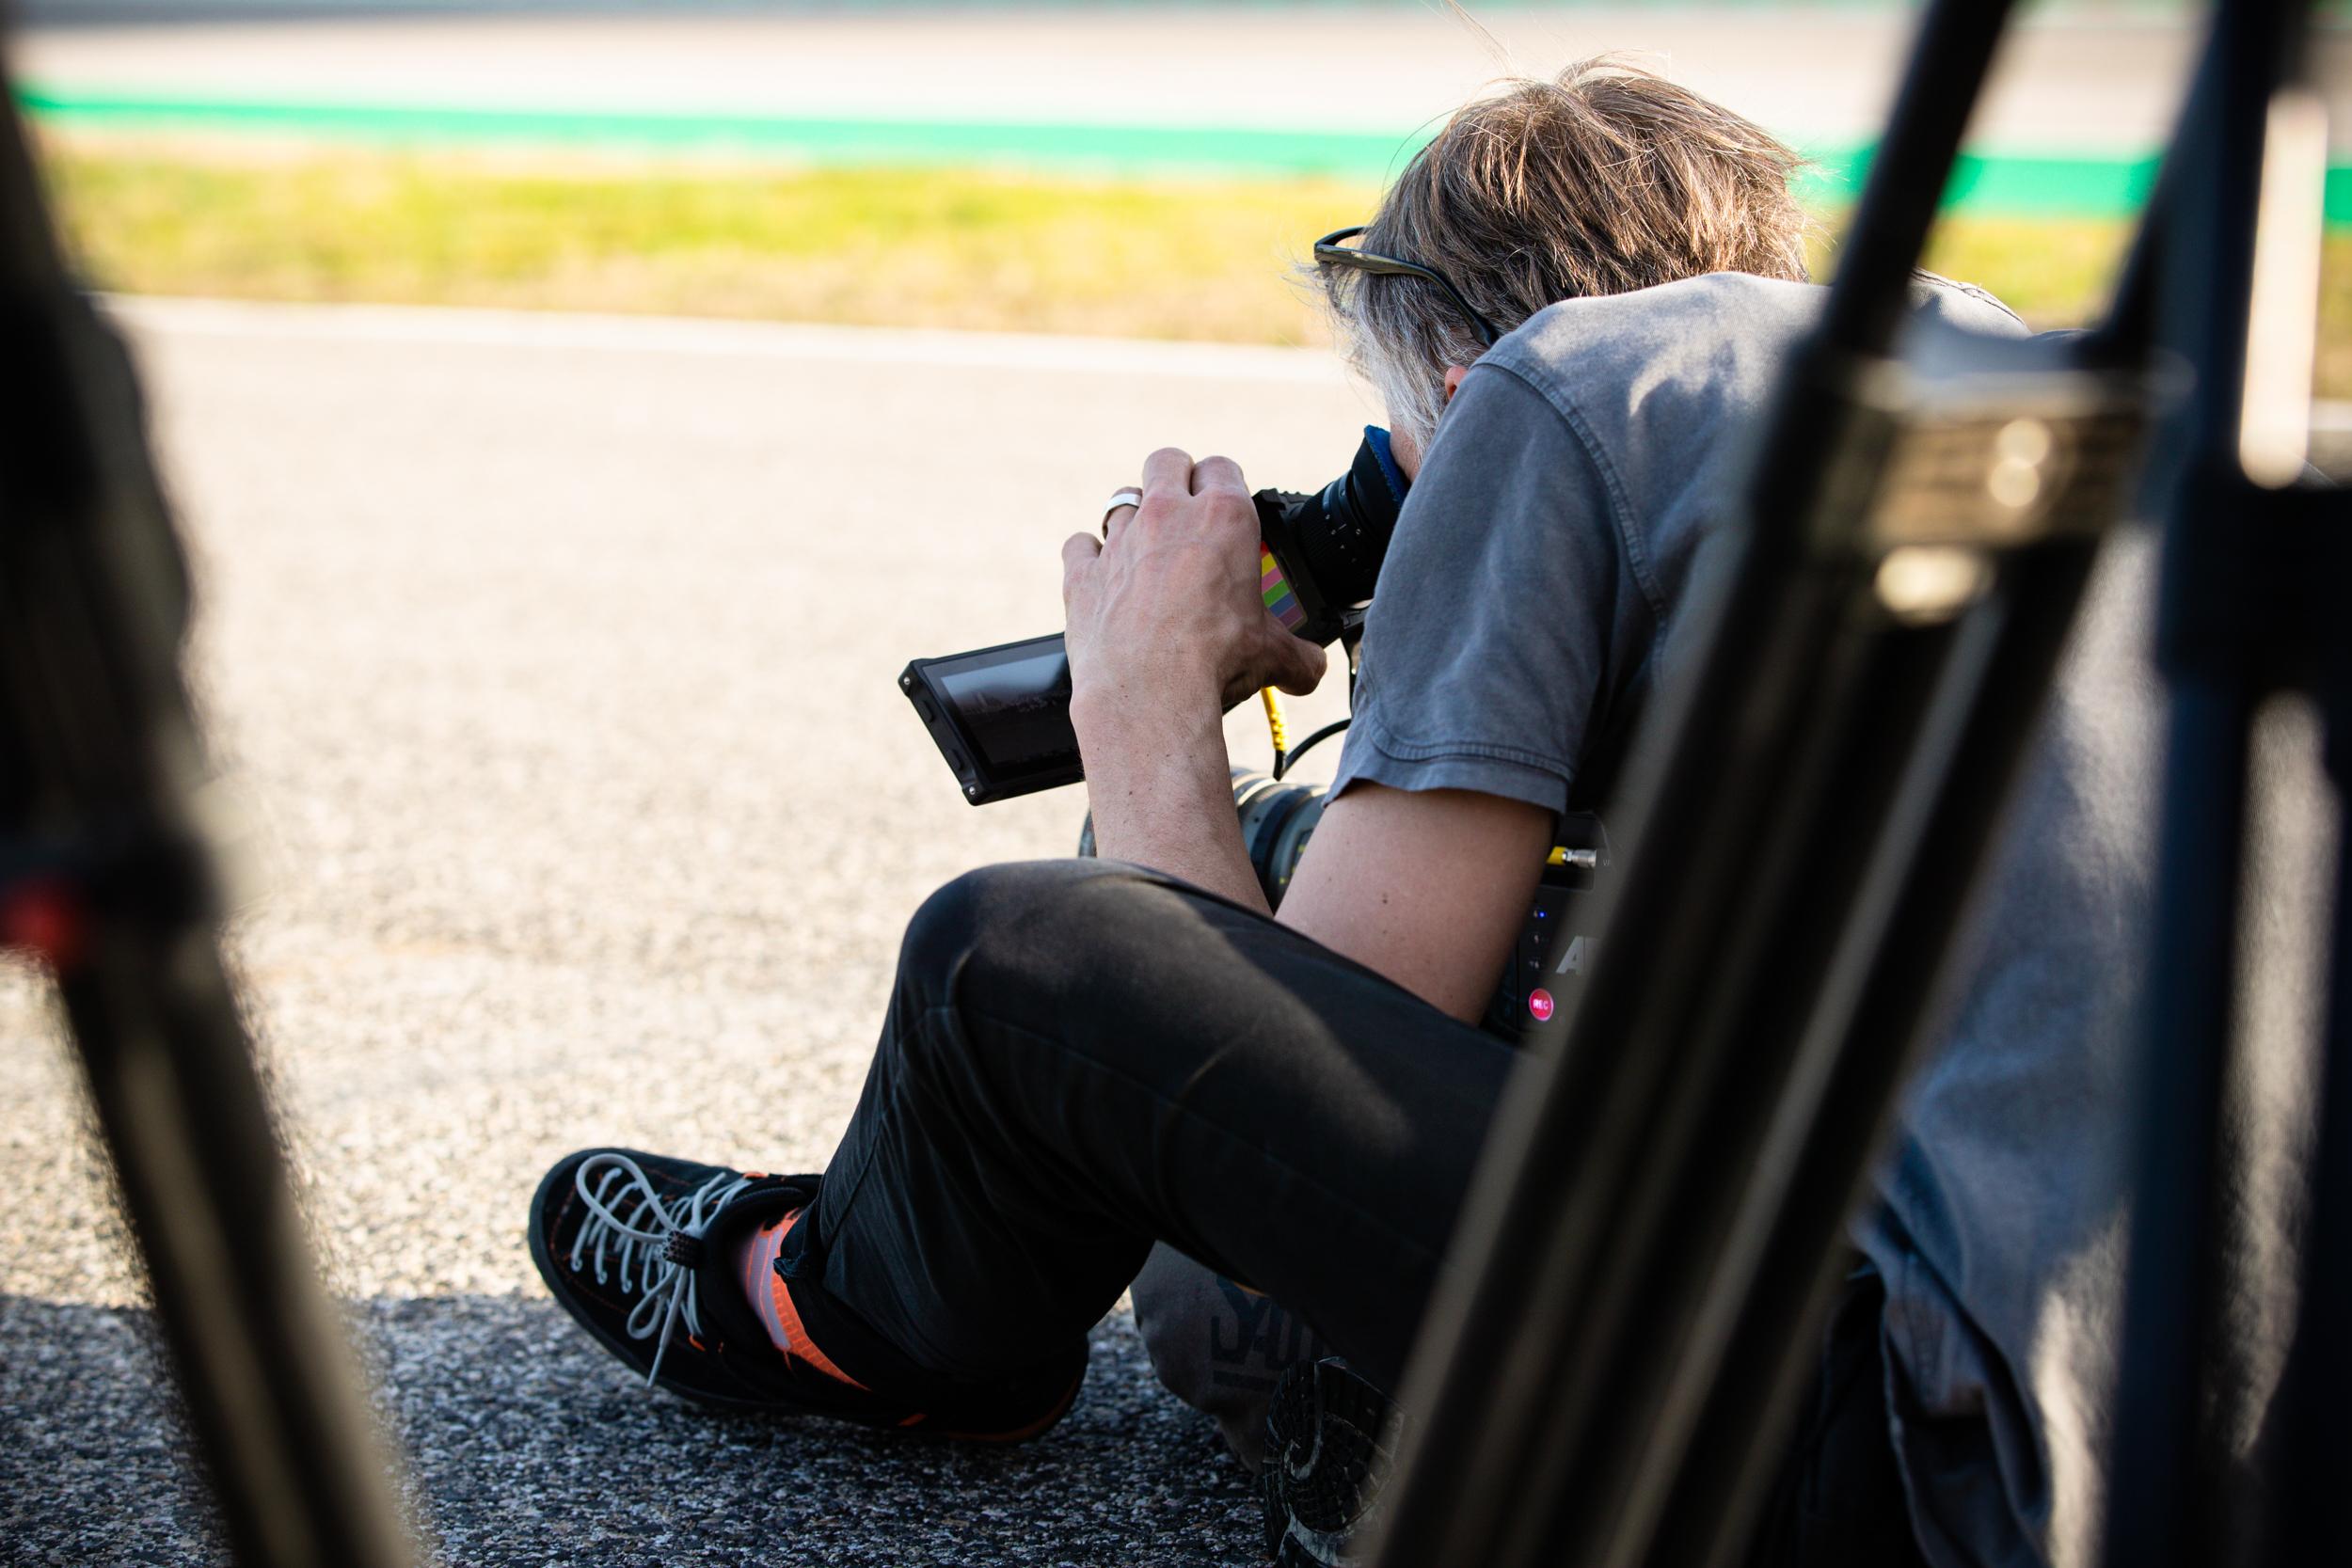 All in Focus? - Alpha Tauri F1 Shakedown 2021